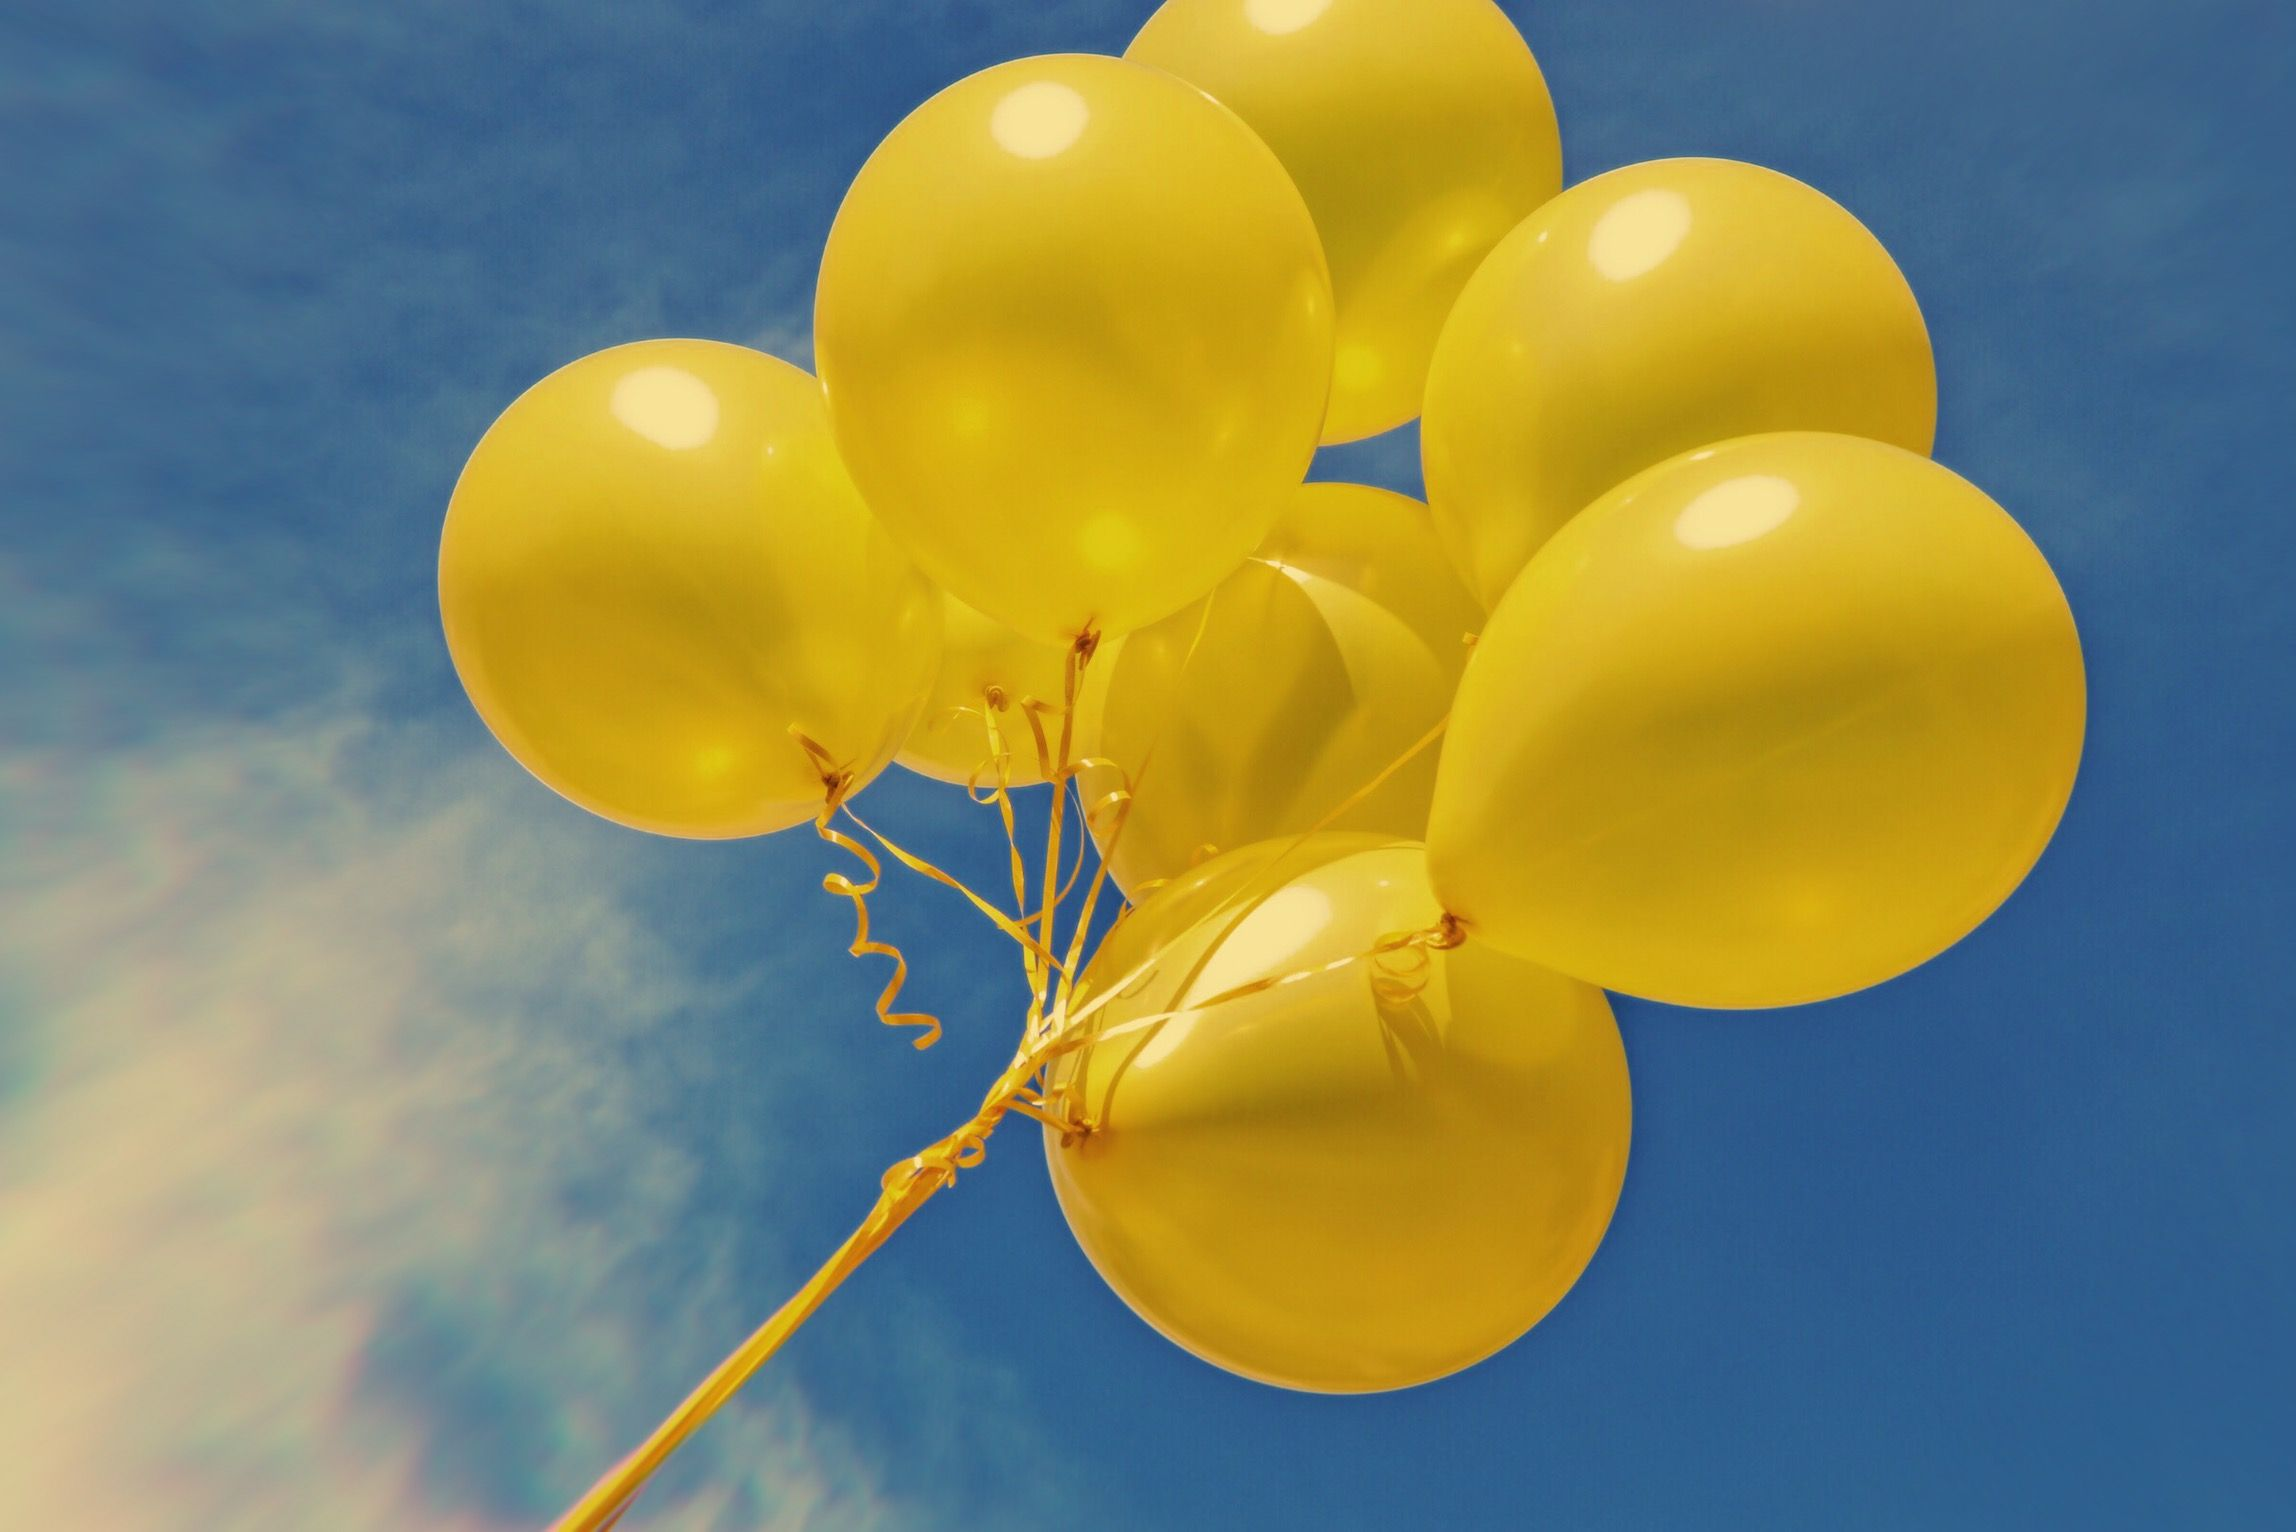 Yellow balloons aesthetic Yellow balloons, Balloons